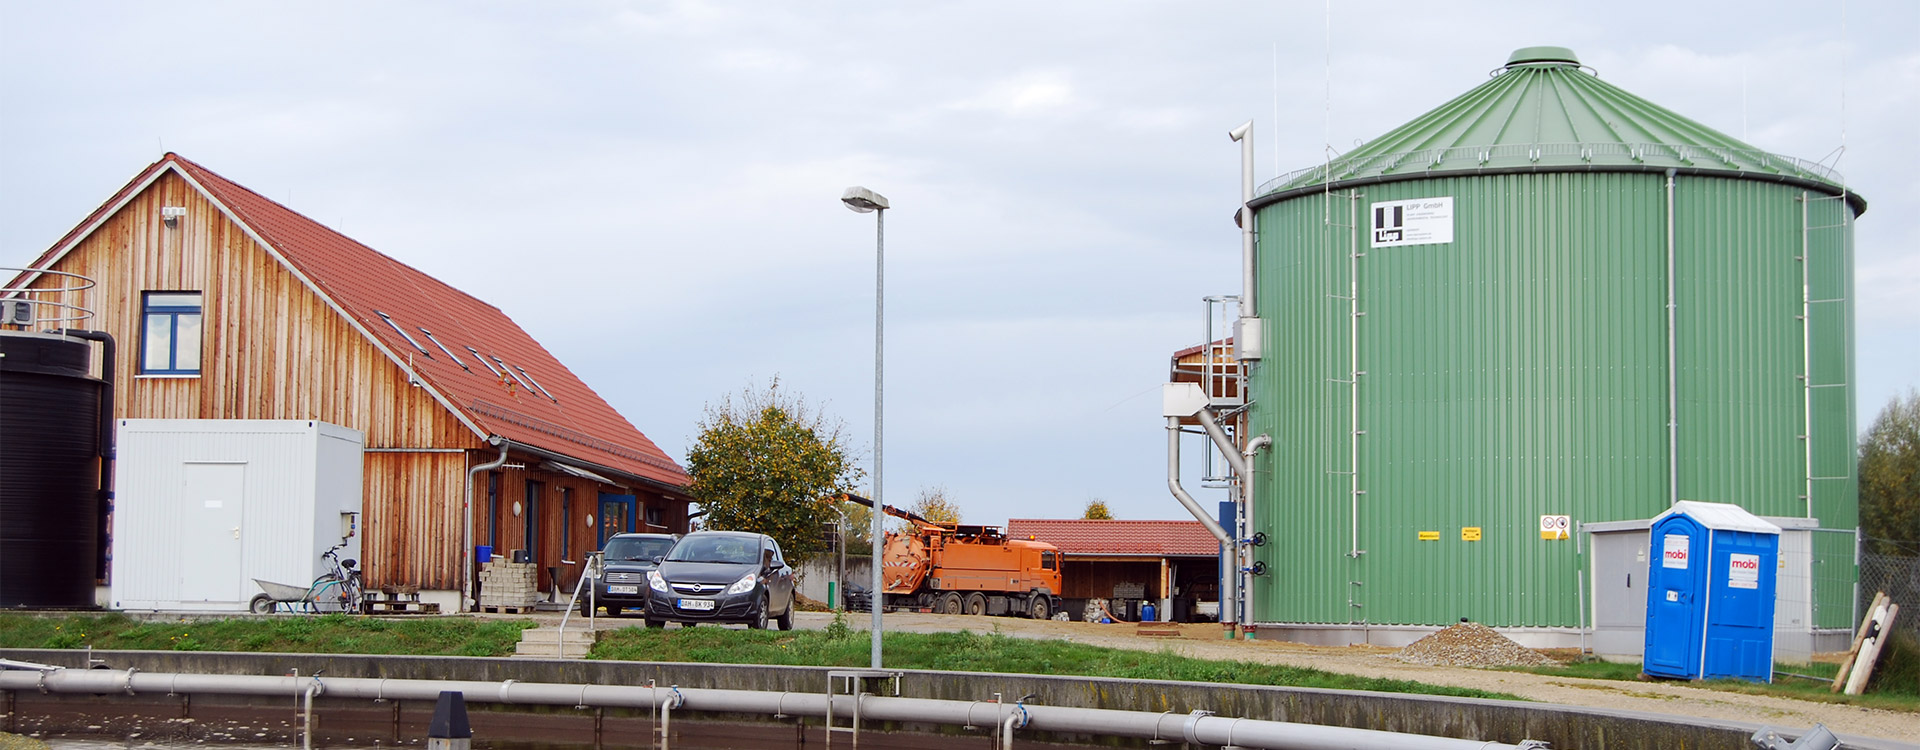 Industrie Abwasseraufbereitung - Lipp System